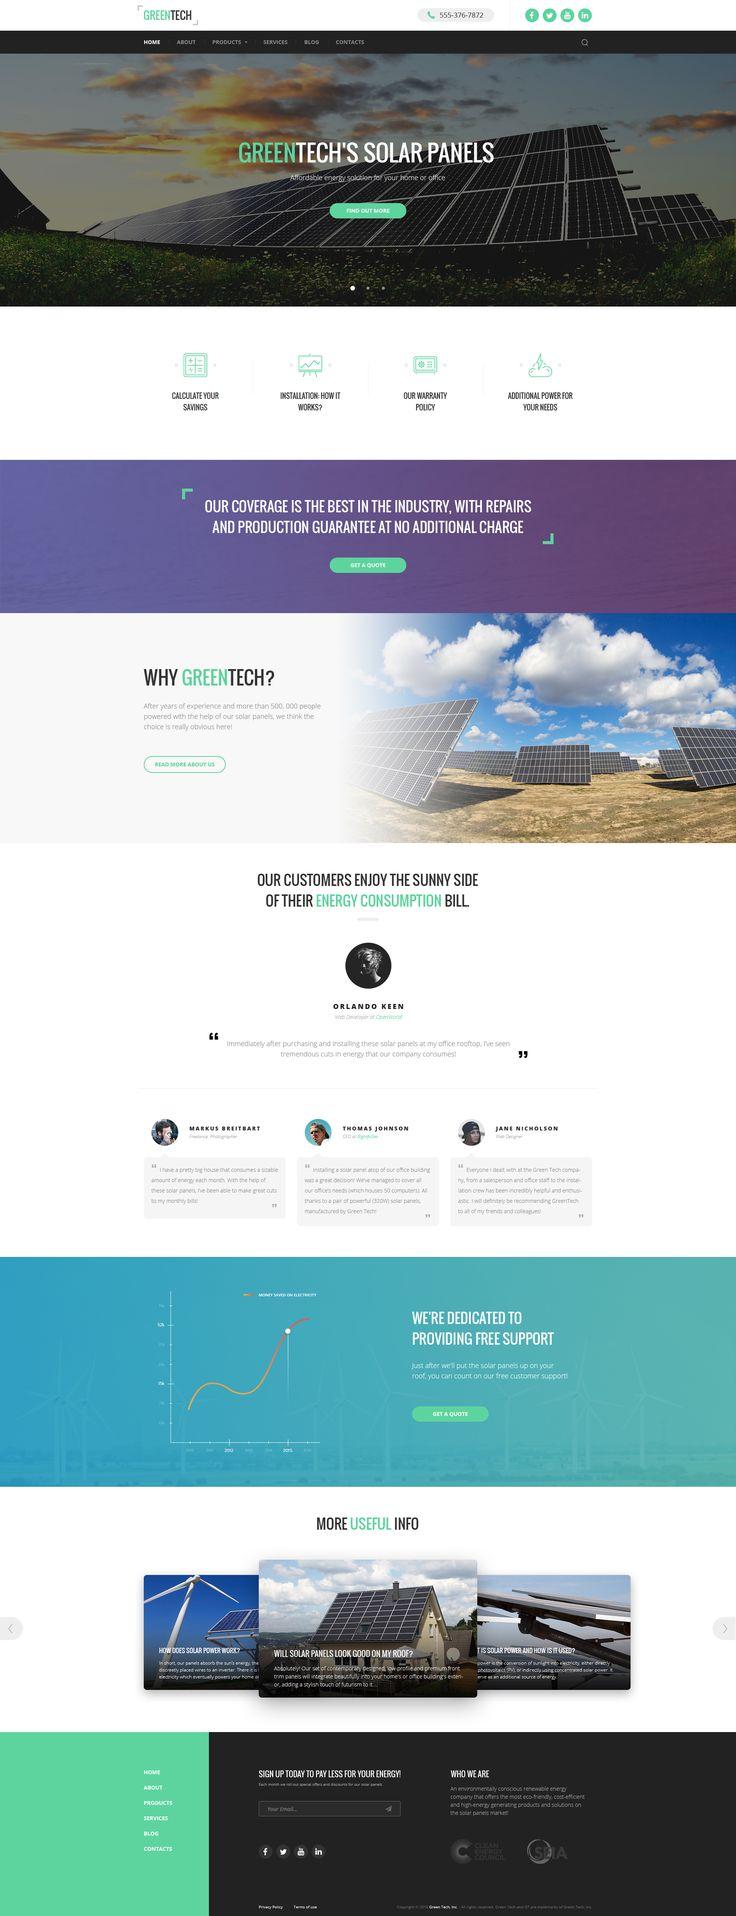 Solar Energy Responsive Website Template - http://www.templatemonster.com/website-templates/responsive-website-template-60074.html